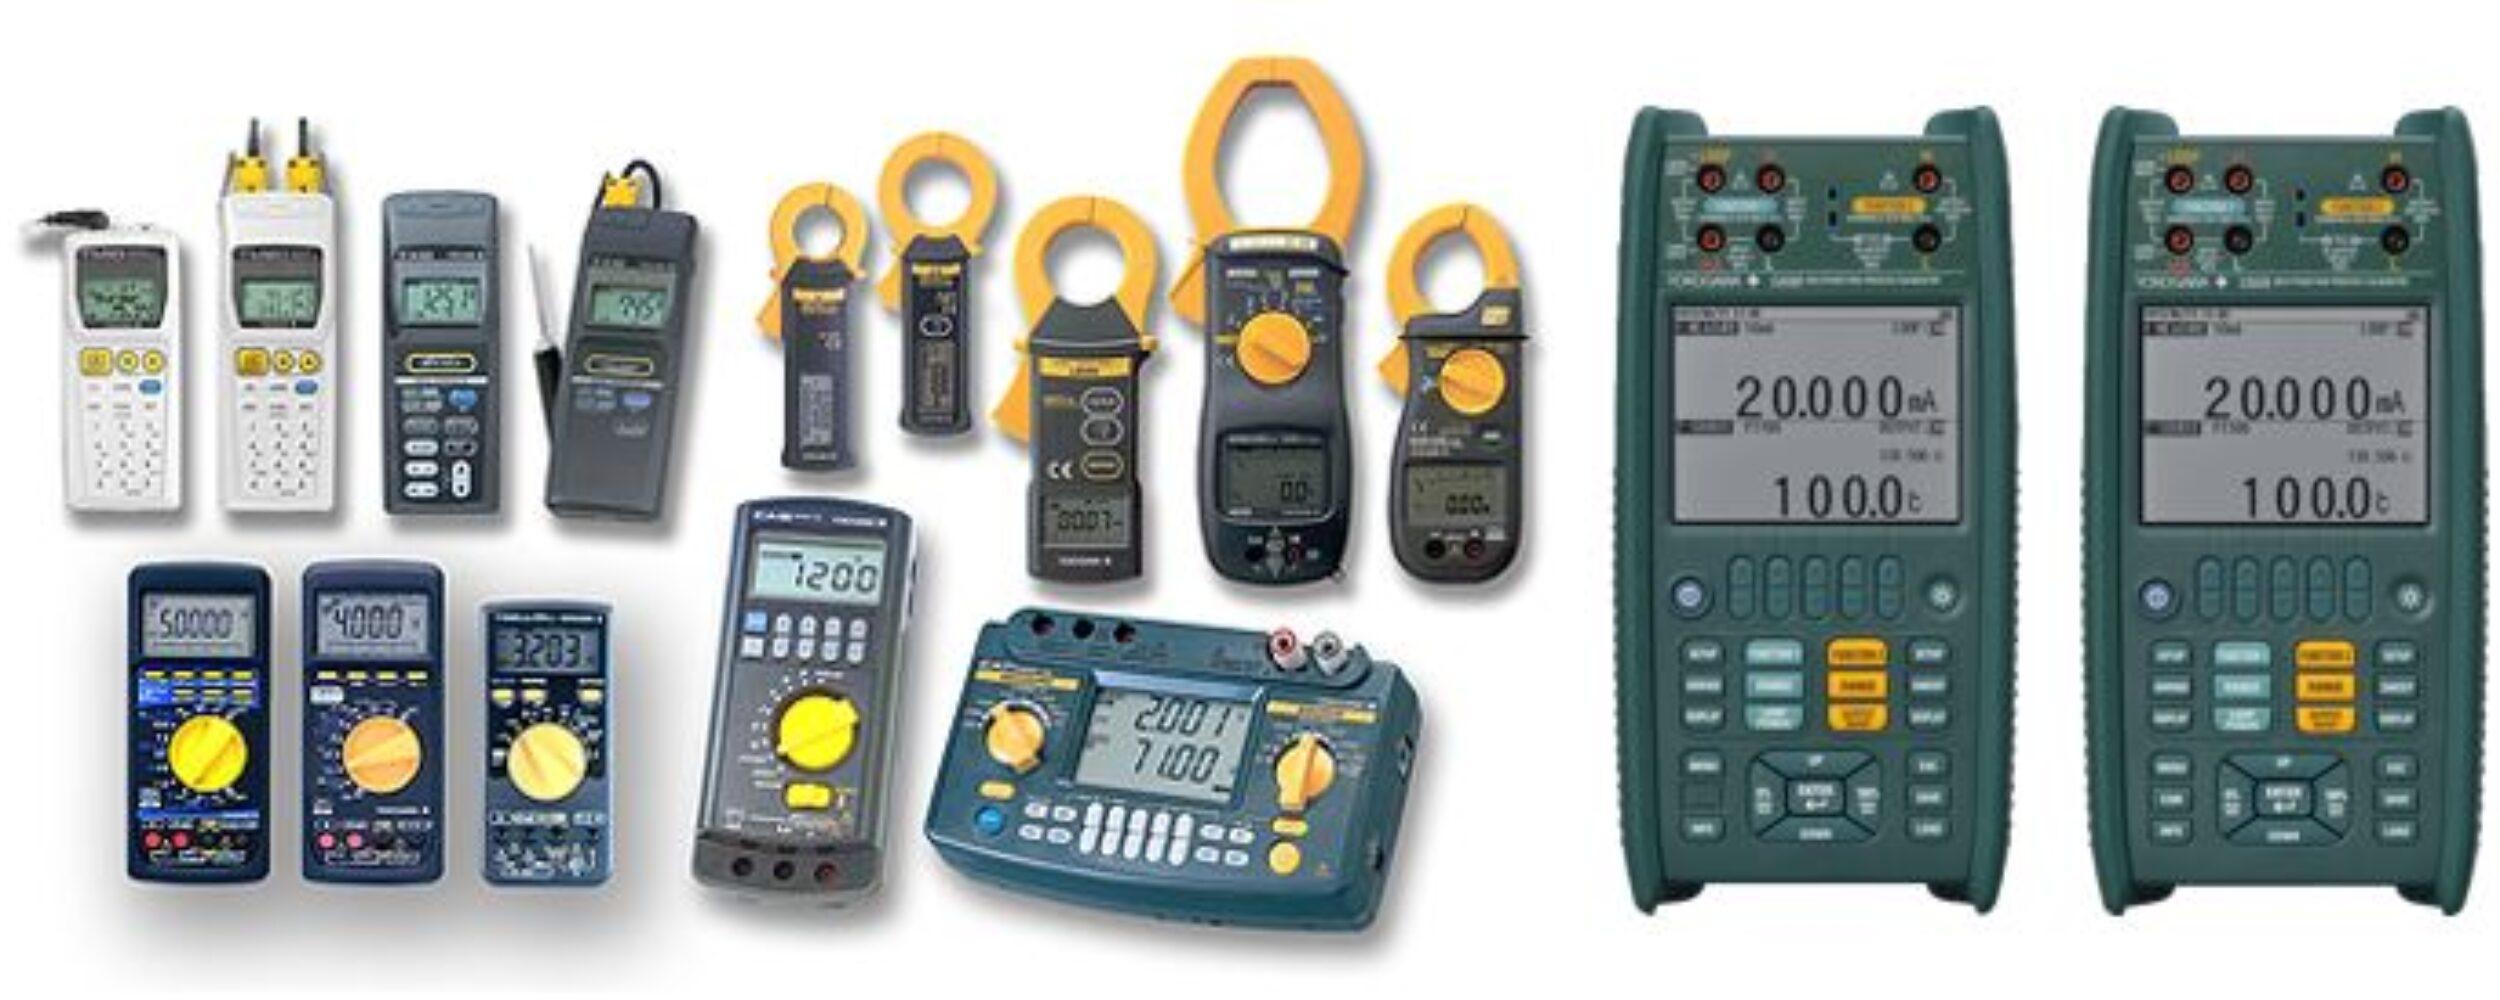 https://www.zenilum.com/wp-content/uploads/2021/09/Measurement-Equipment-2500x1000.jpg